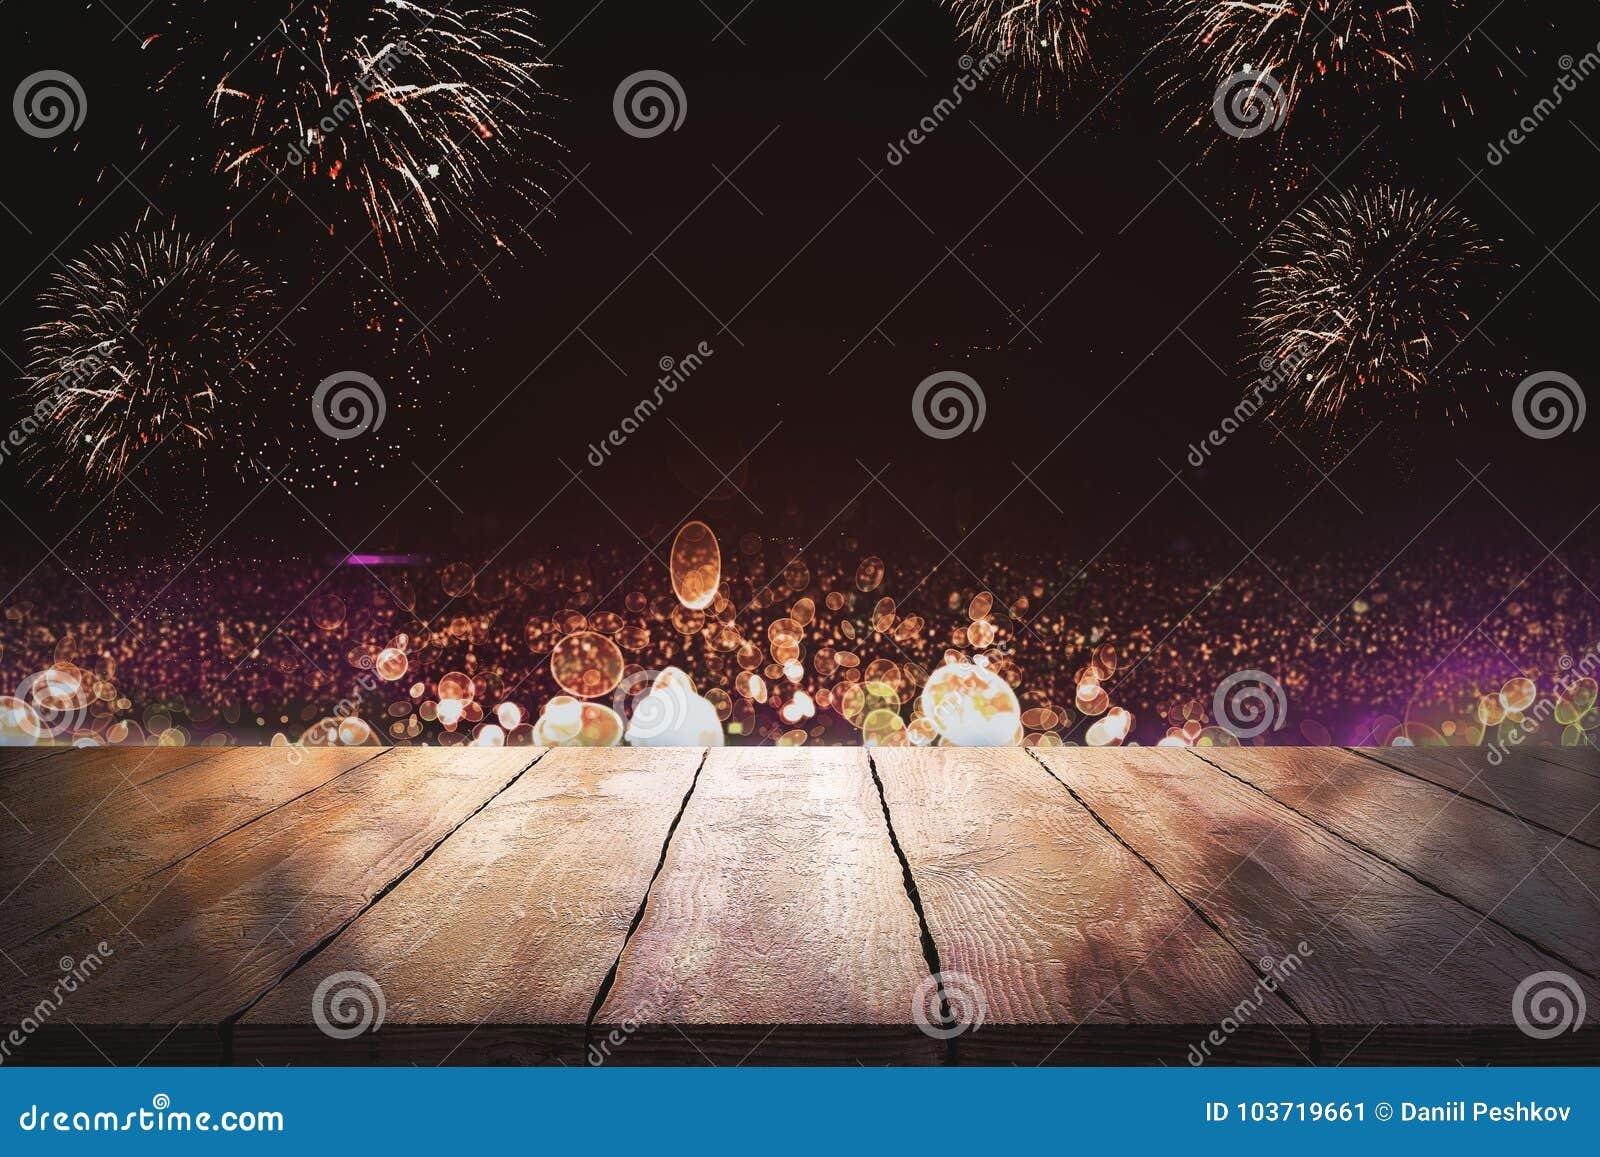 Creative firework wallpaper